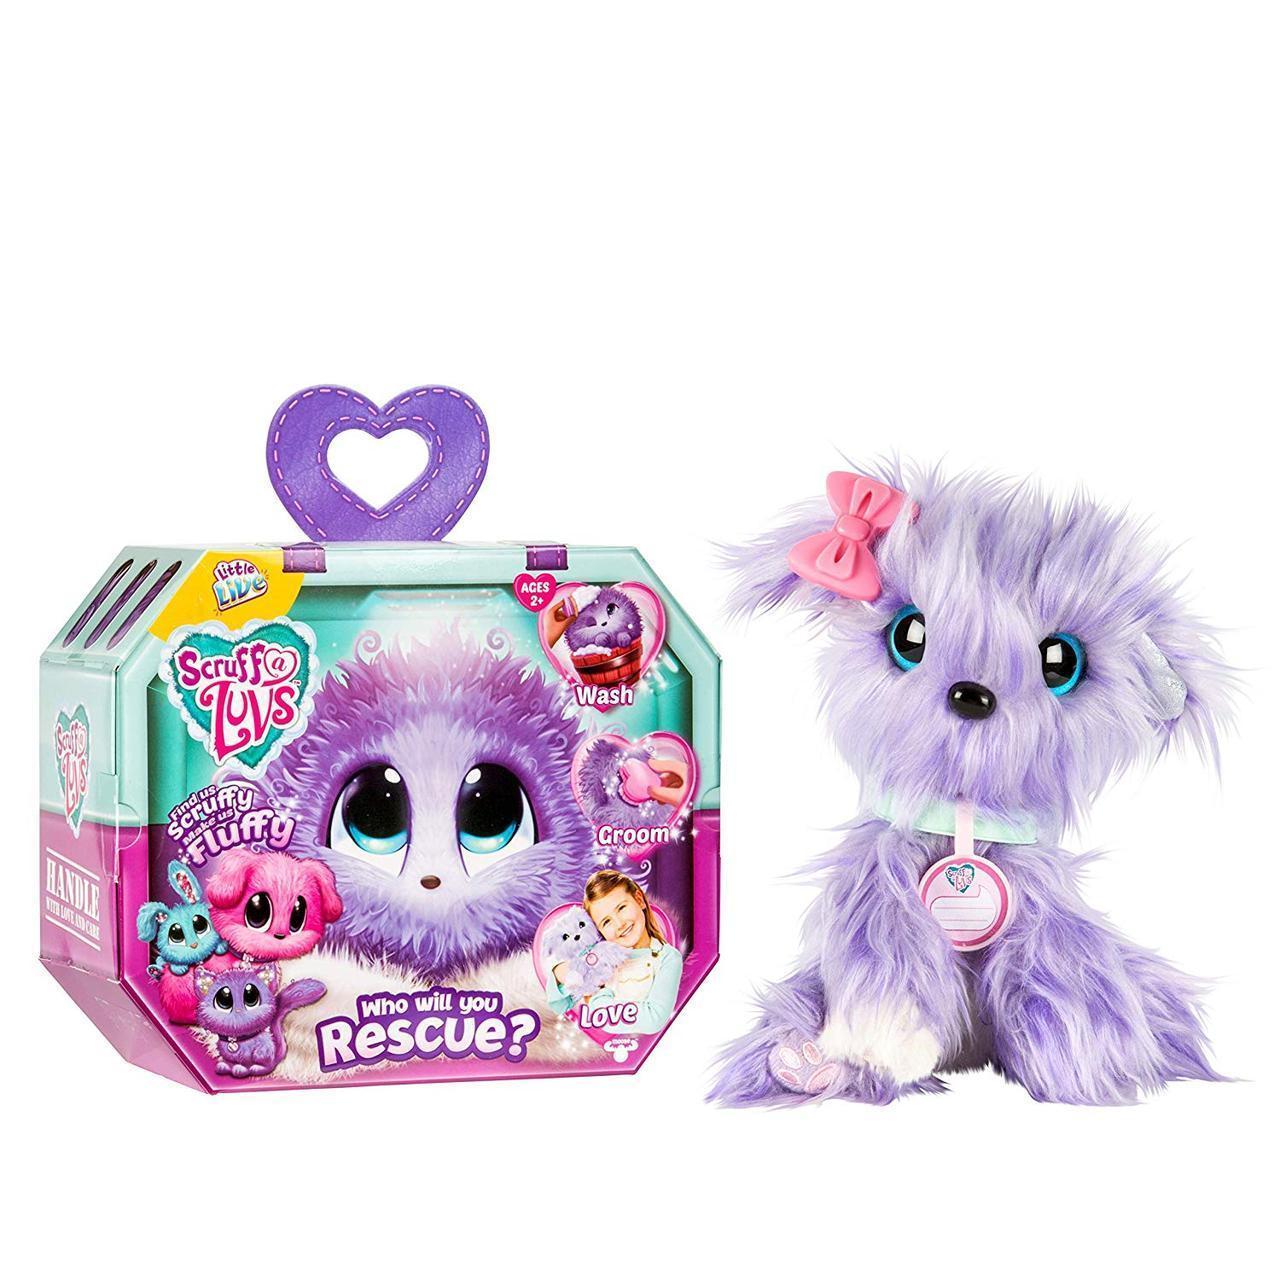 УЦЕНКА! Little Live Питомец сюрприз Няшка Потеряшка Фиолетовый Scruff-a-Luvs plush mystery rescue pet Purple